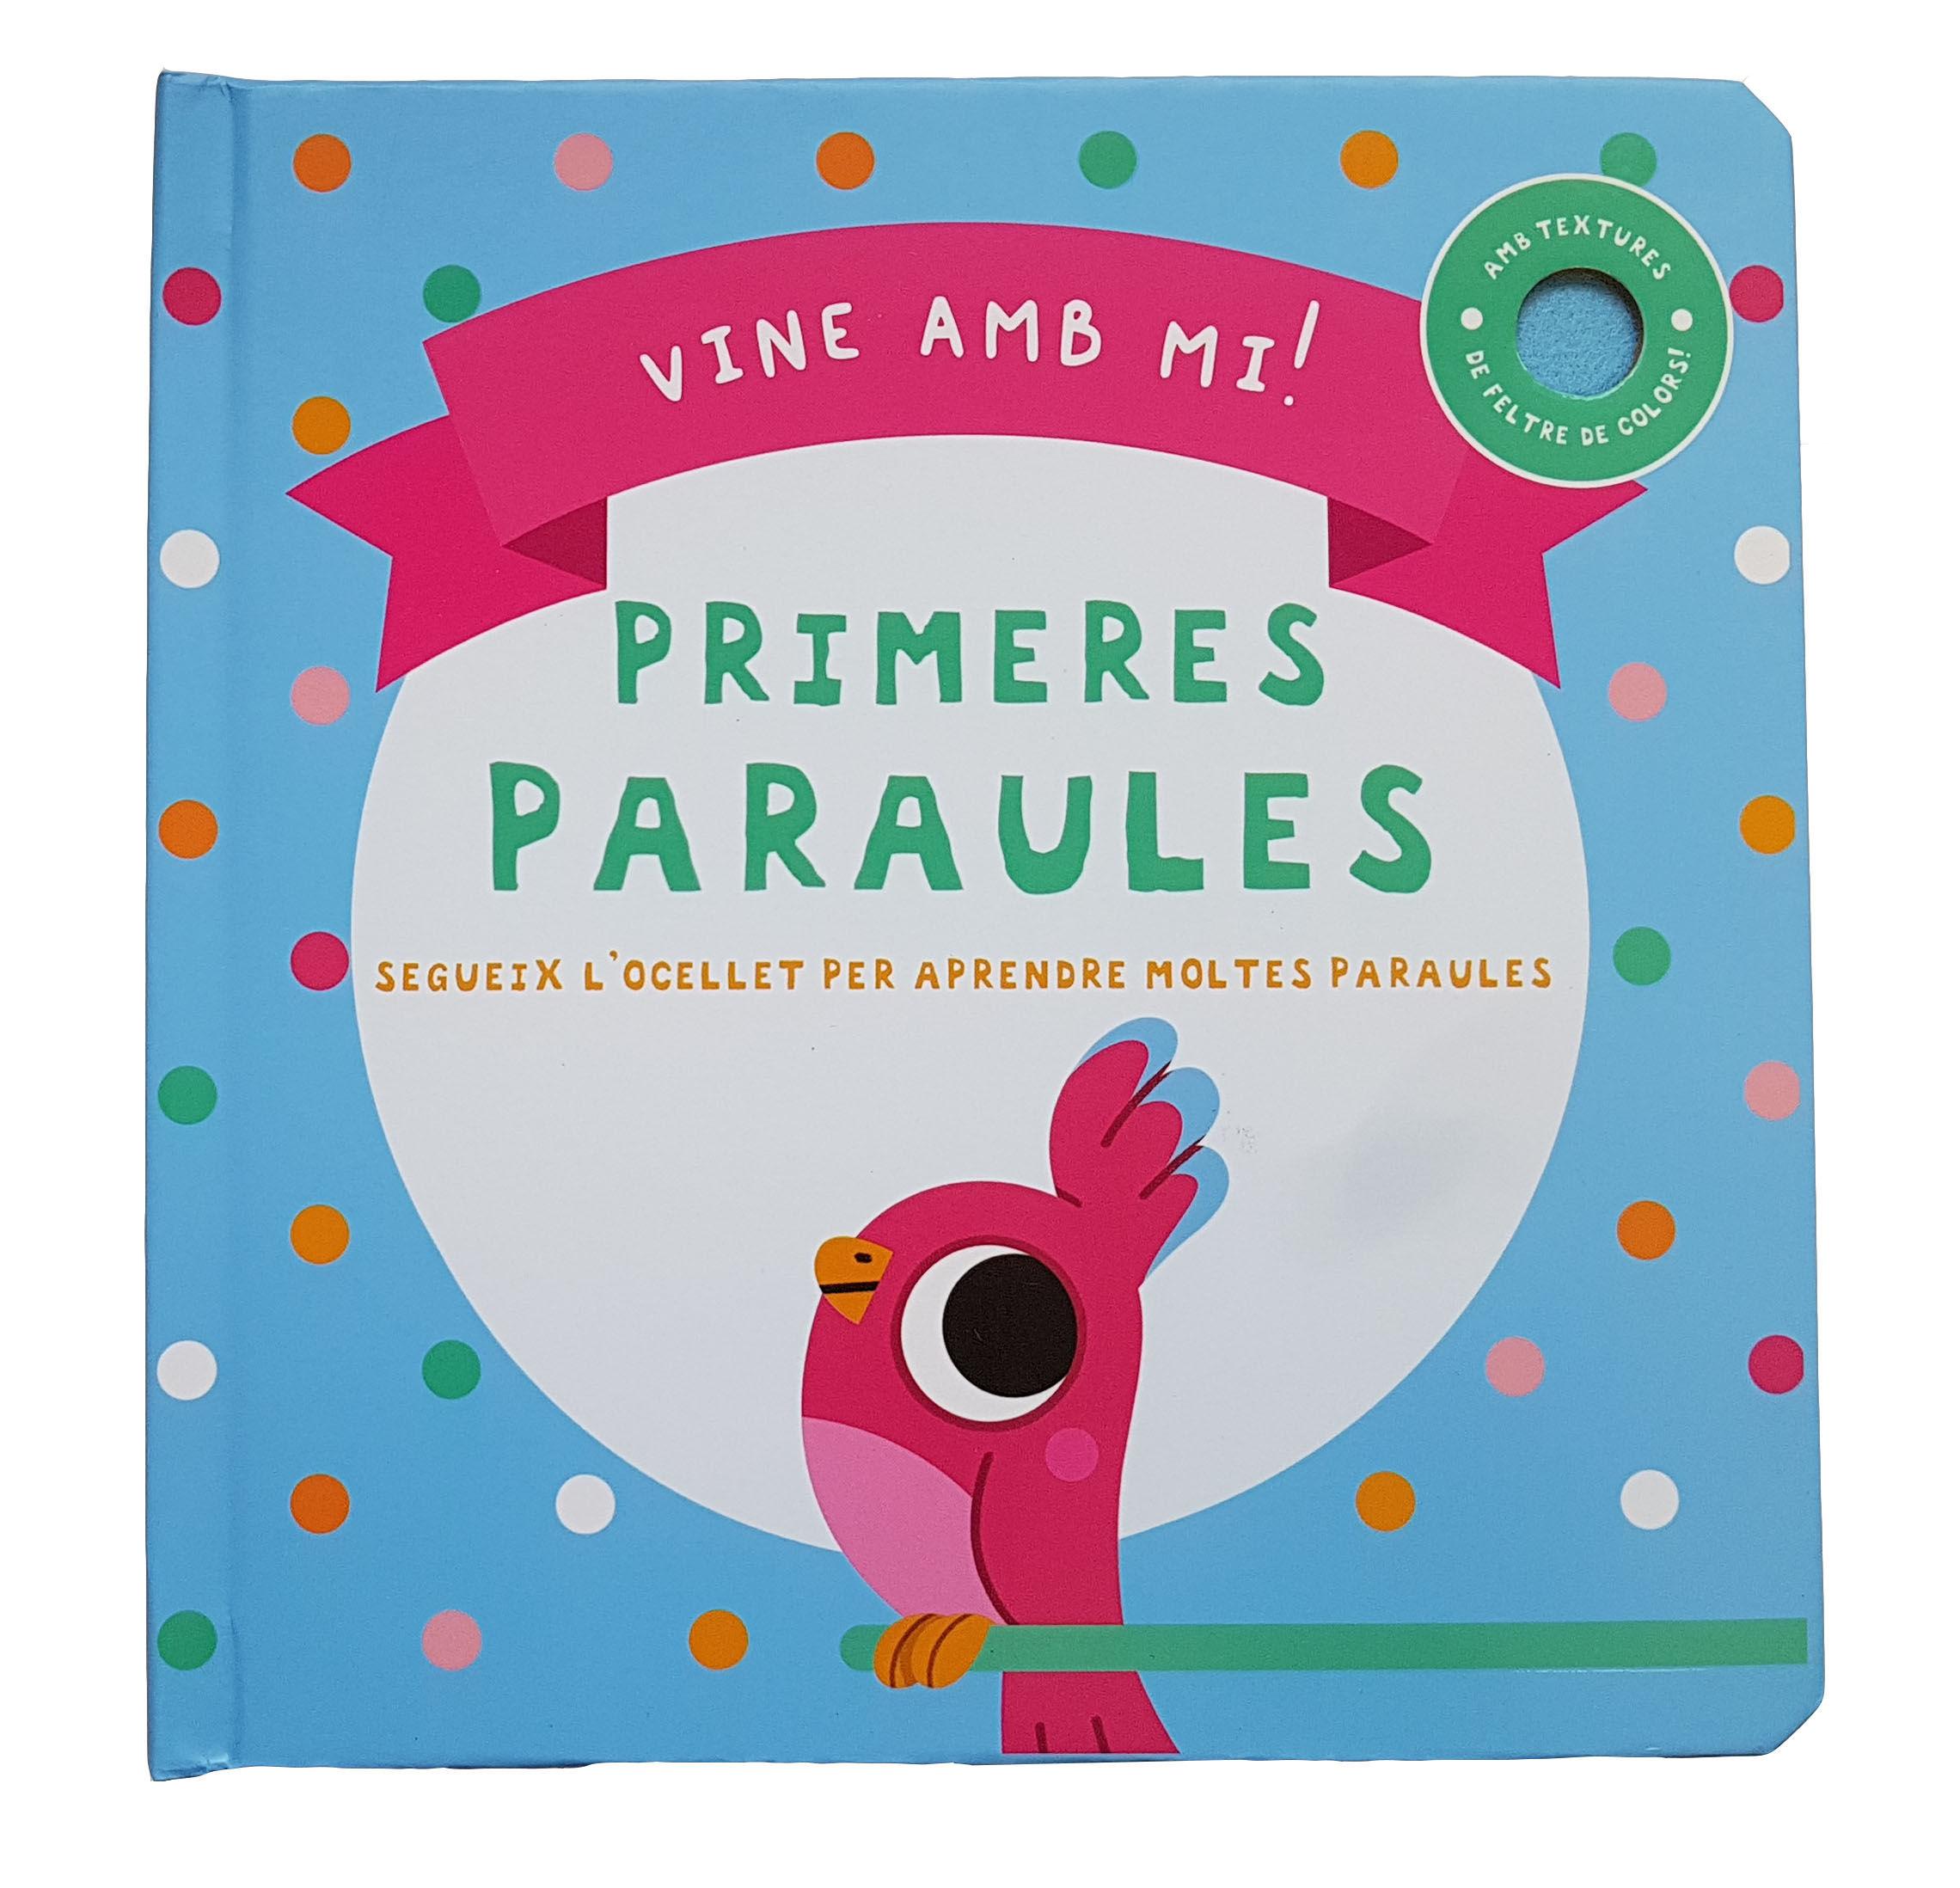 VINE AMB MI PRIMERES PARAULES